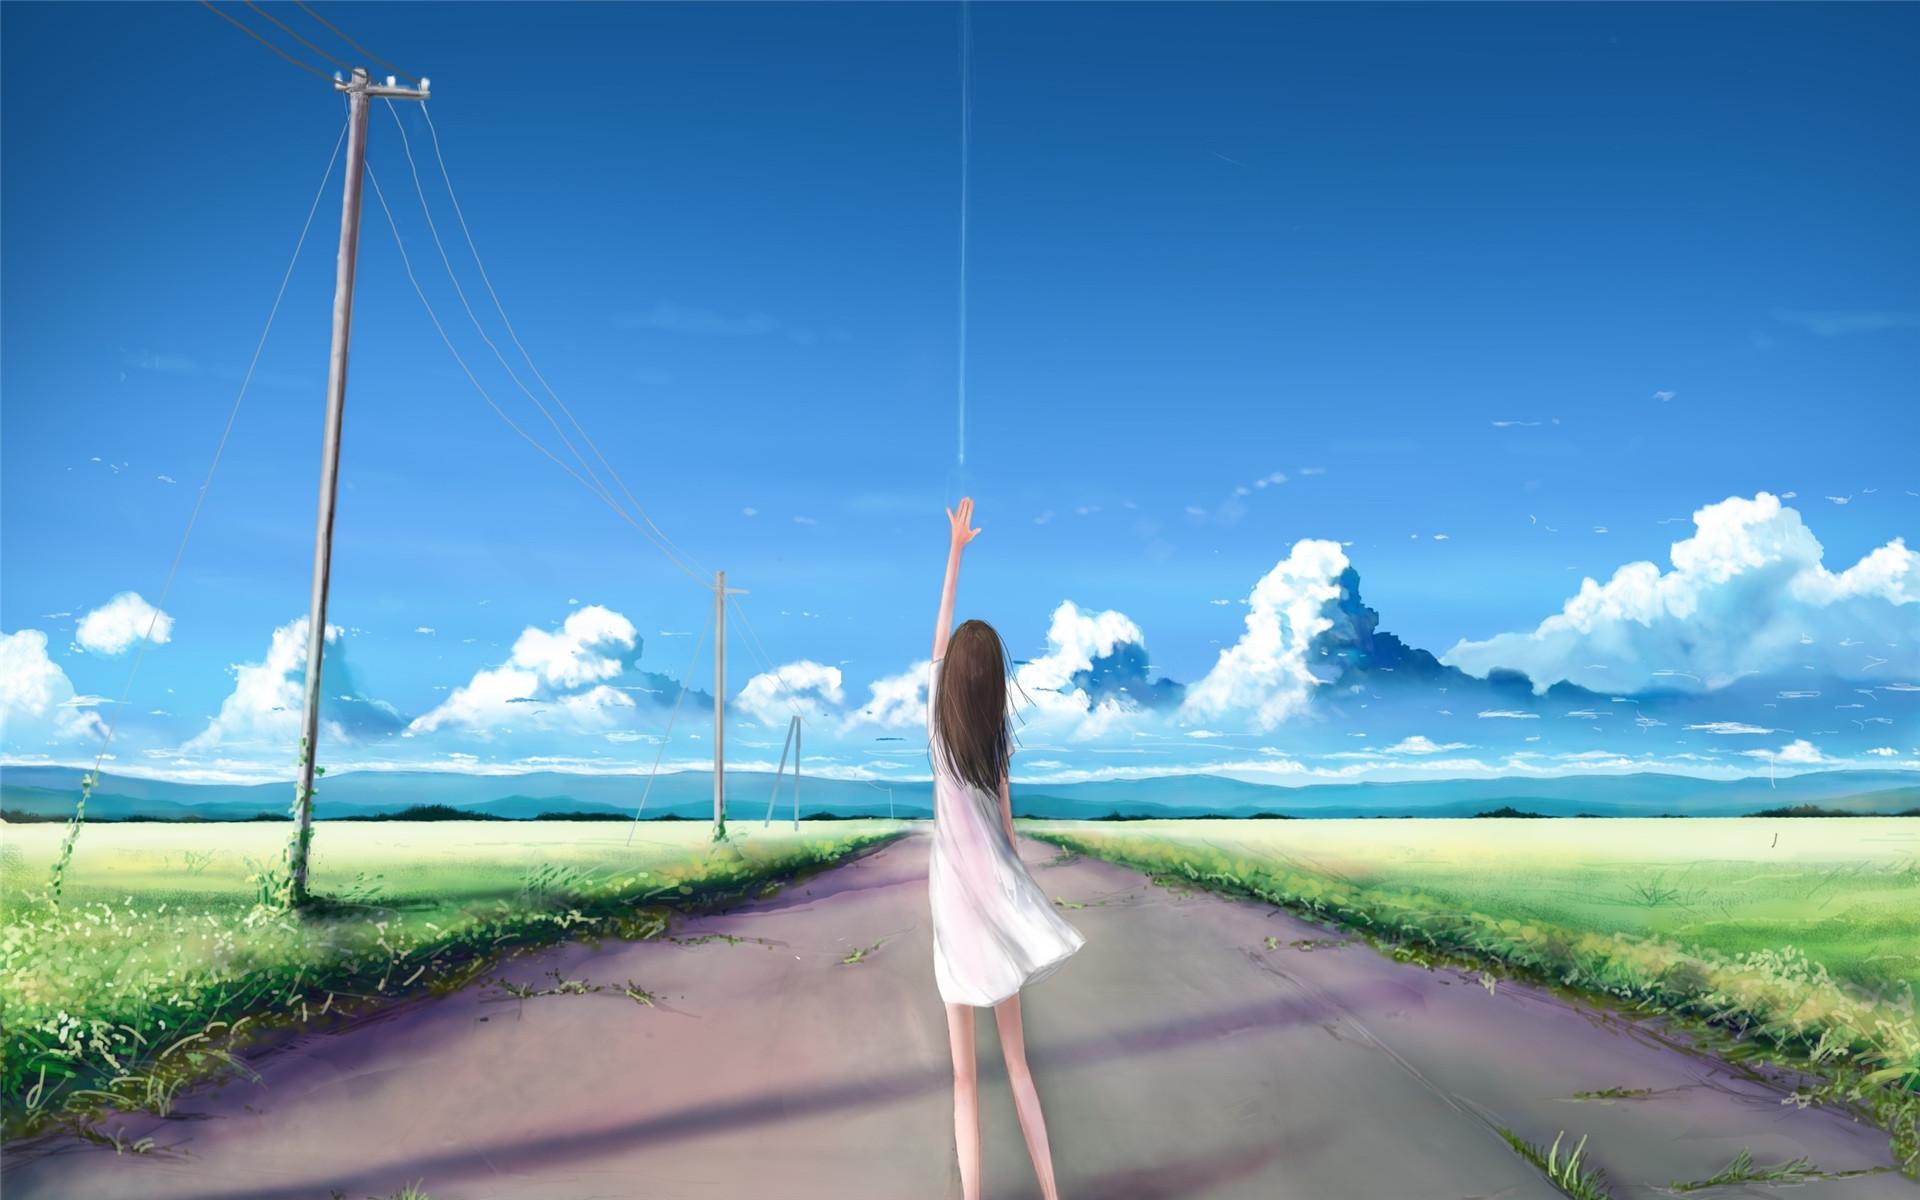 Anime Video Wallpaper 好看的动漫场景人物唯美电脑壁纸图片 卡通动漫 壁纸下载 美桌网